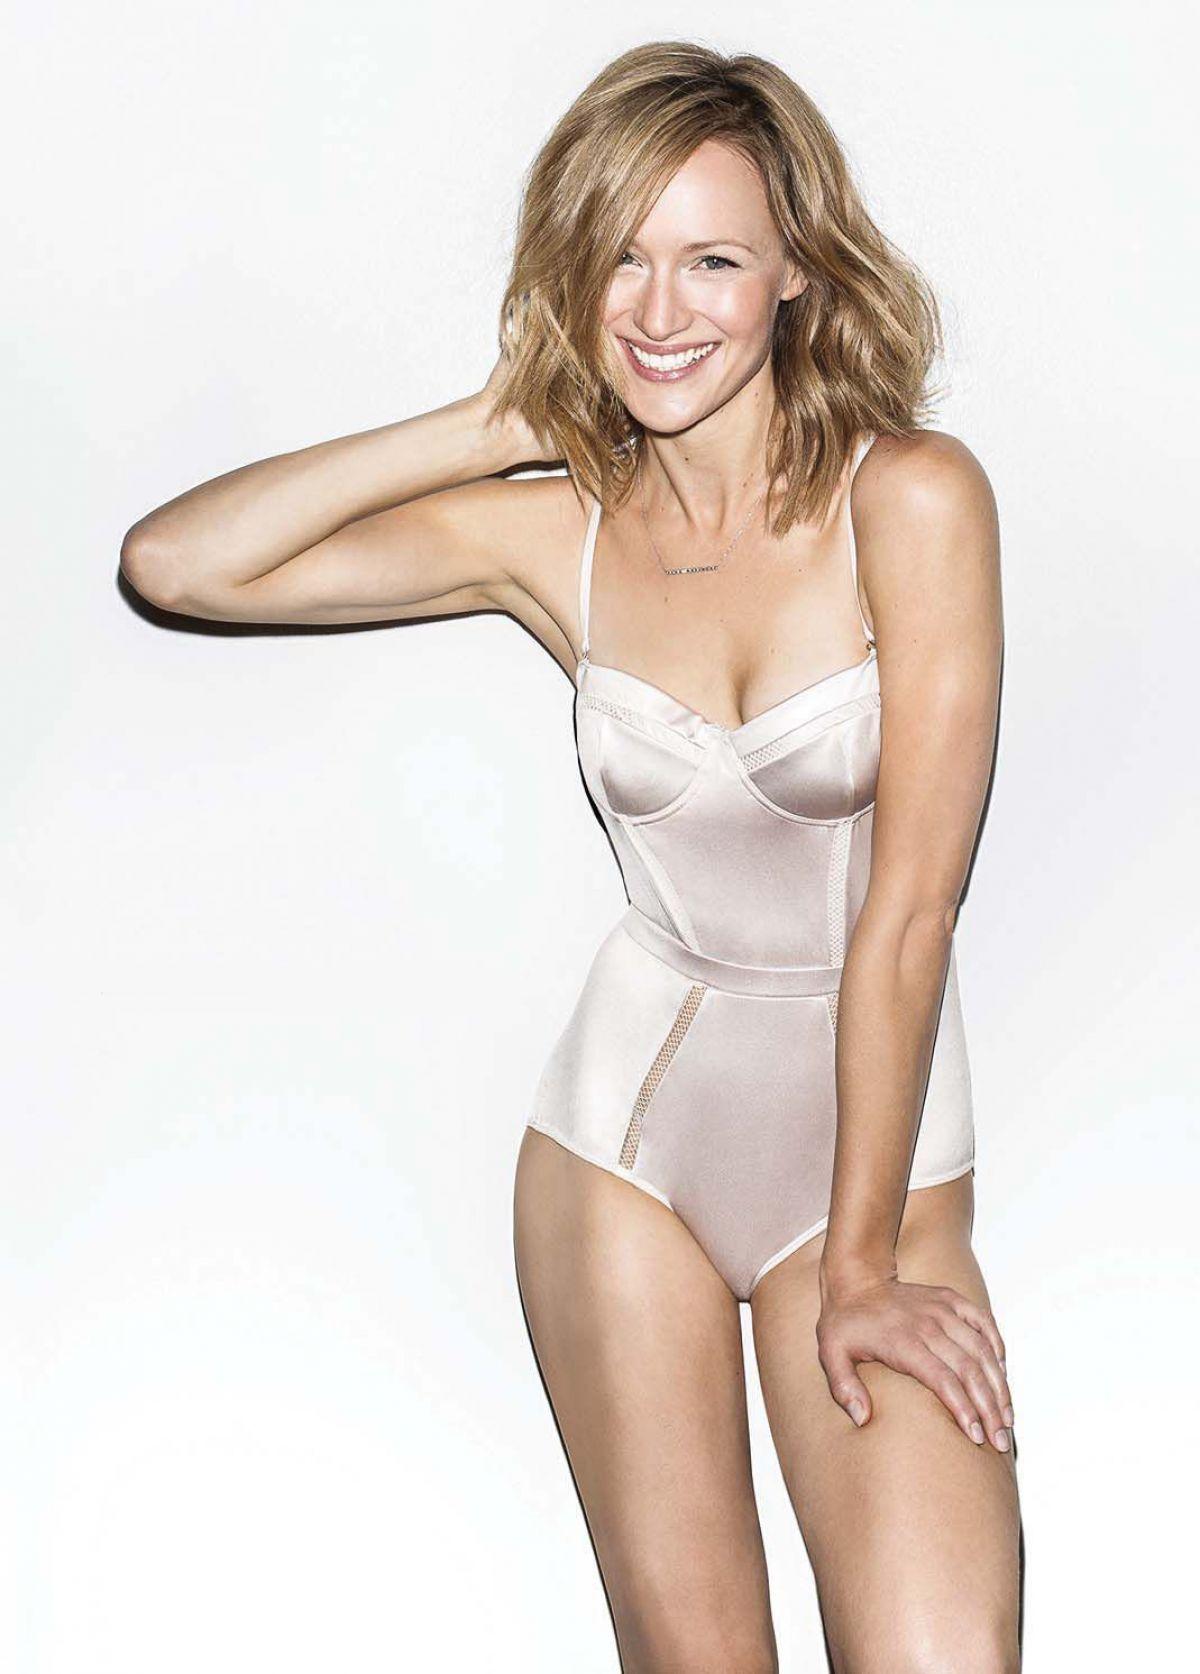 Jennifer Freeman Nude Delightful kerry bishe, movie actress | leaked celebs | pinterest | actresses